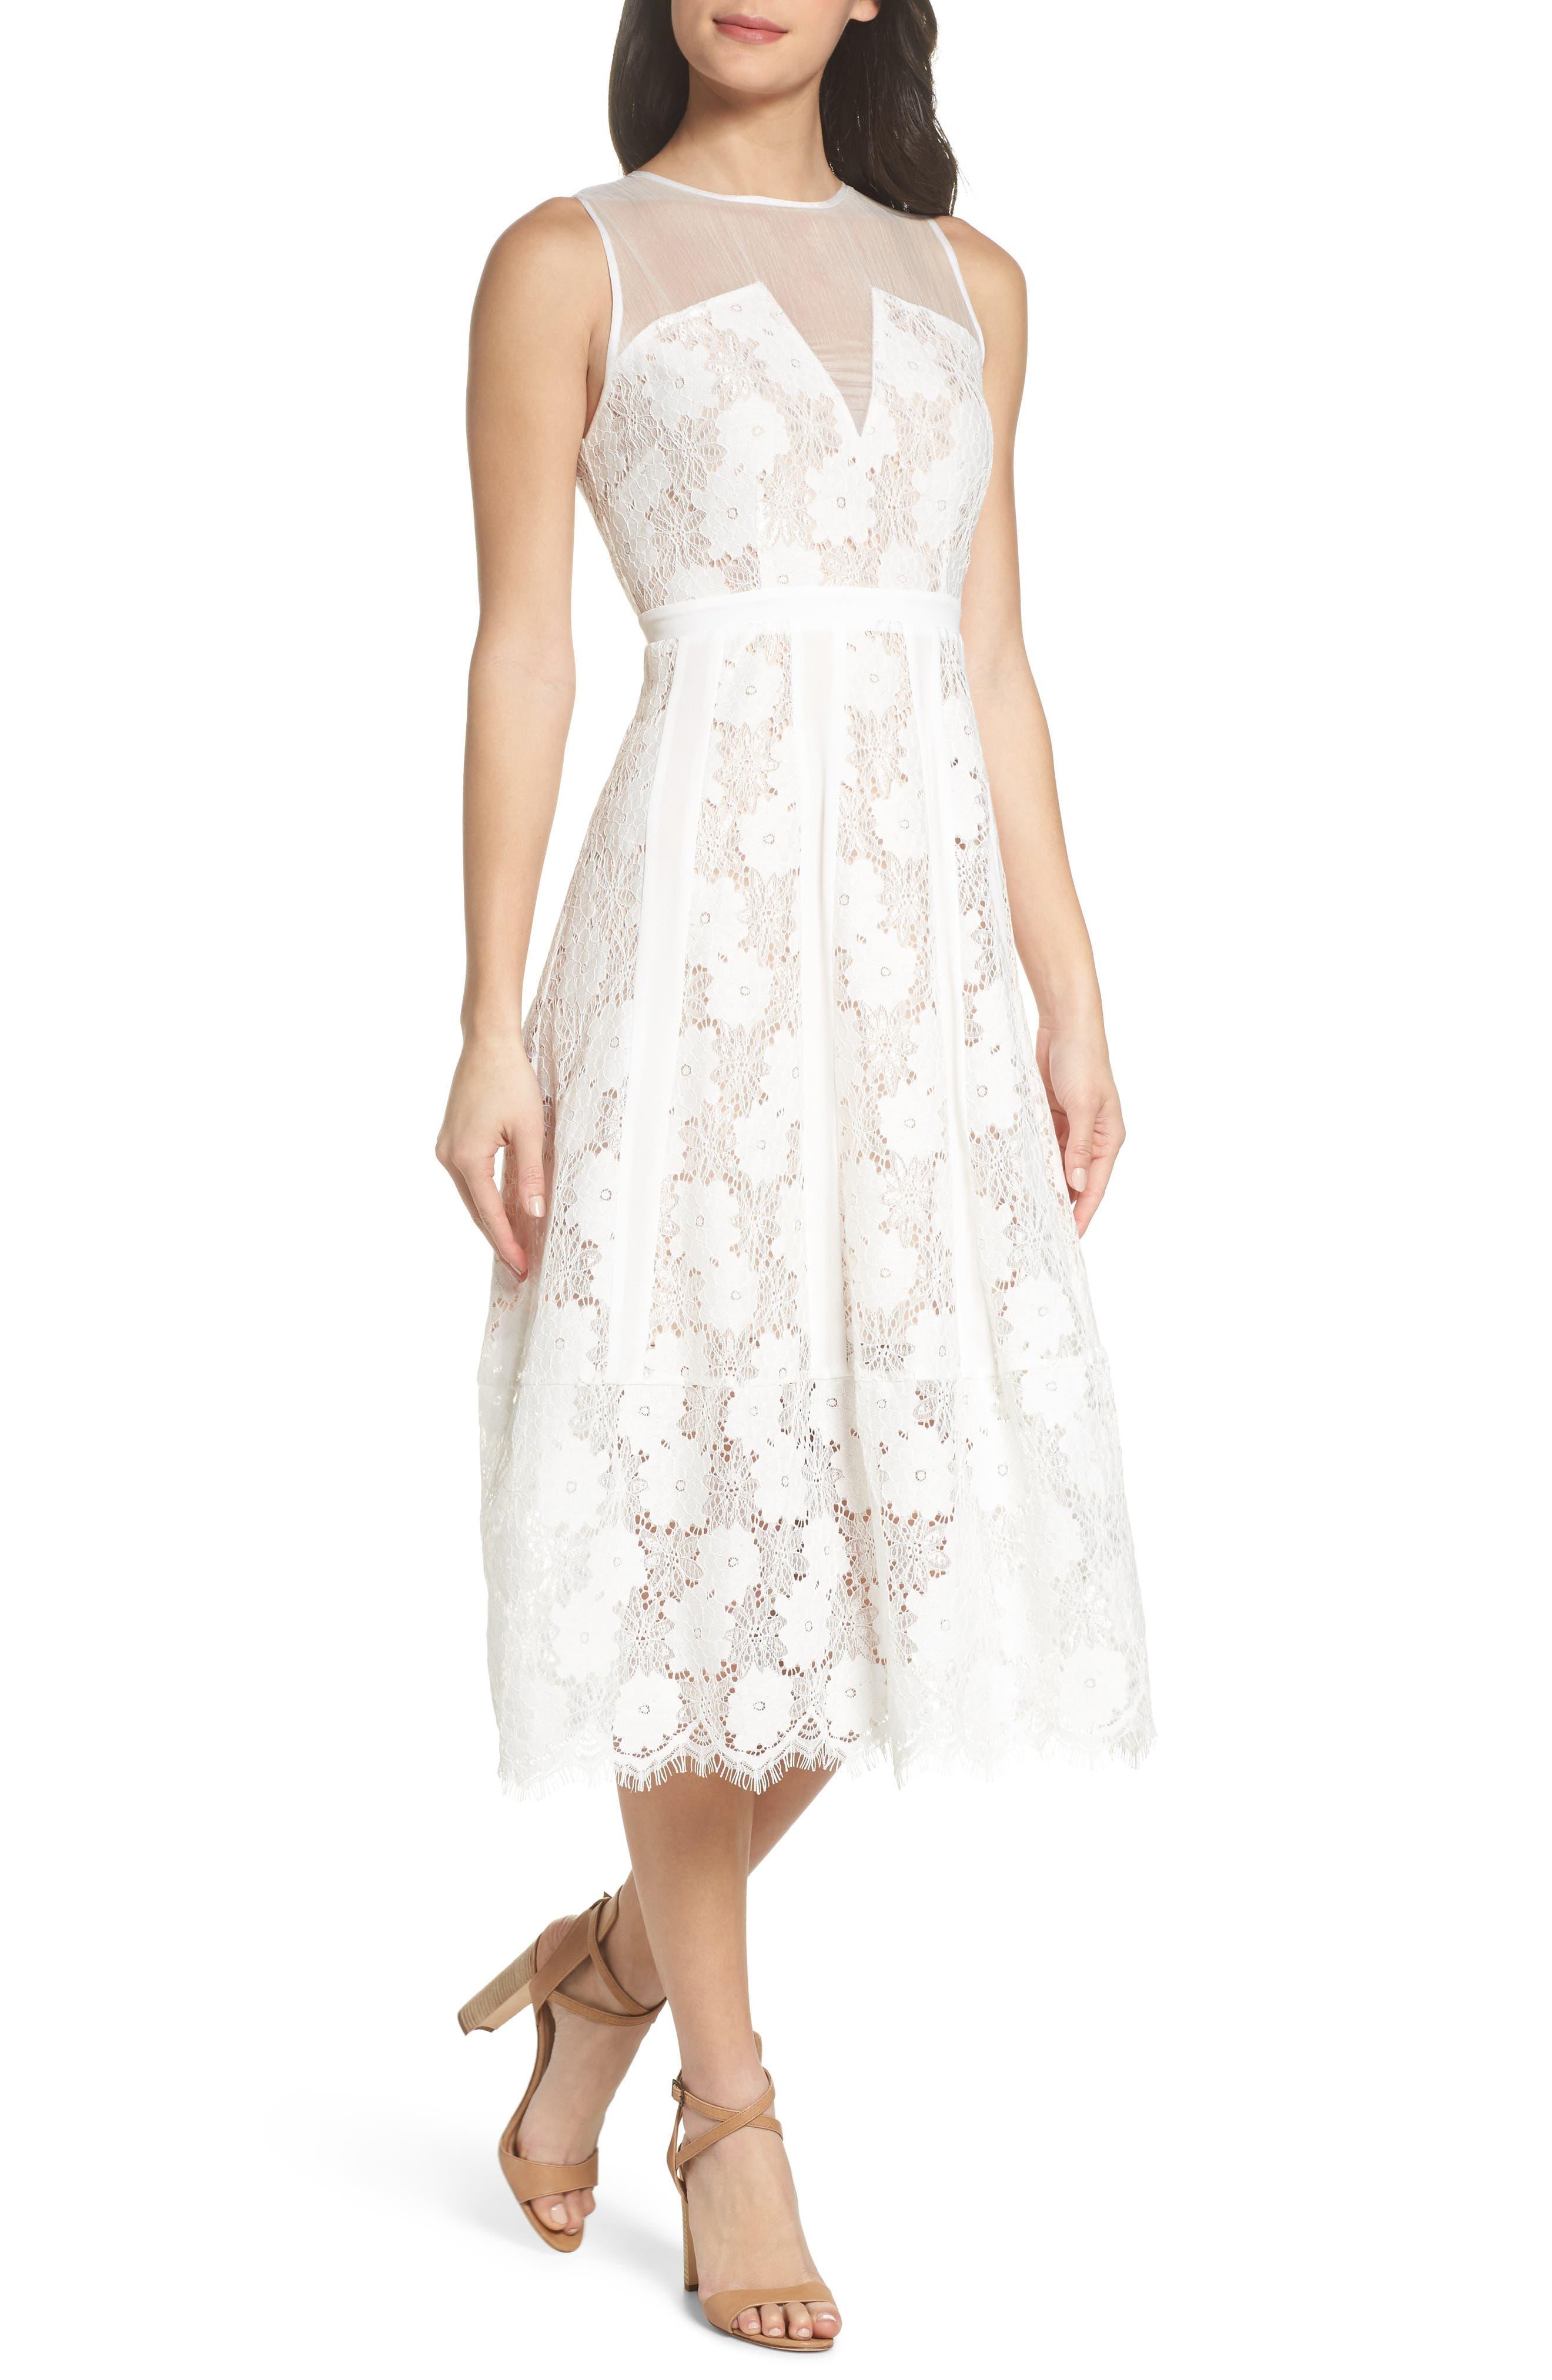 Alternate Image 1 Selected - Chelsea28 Lace Midi Dress